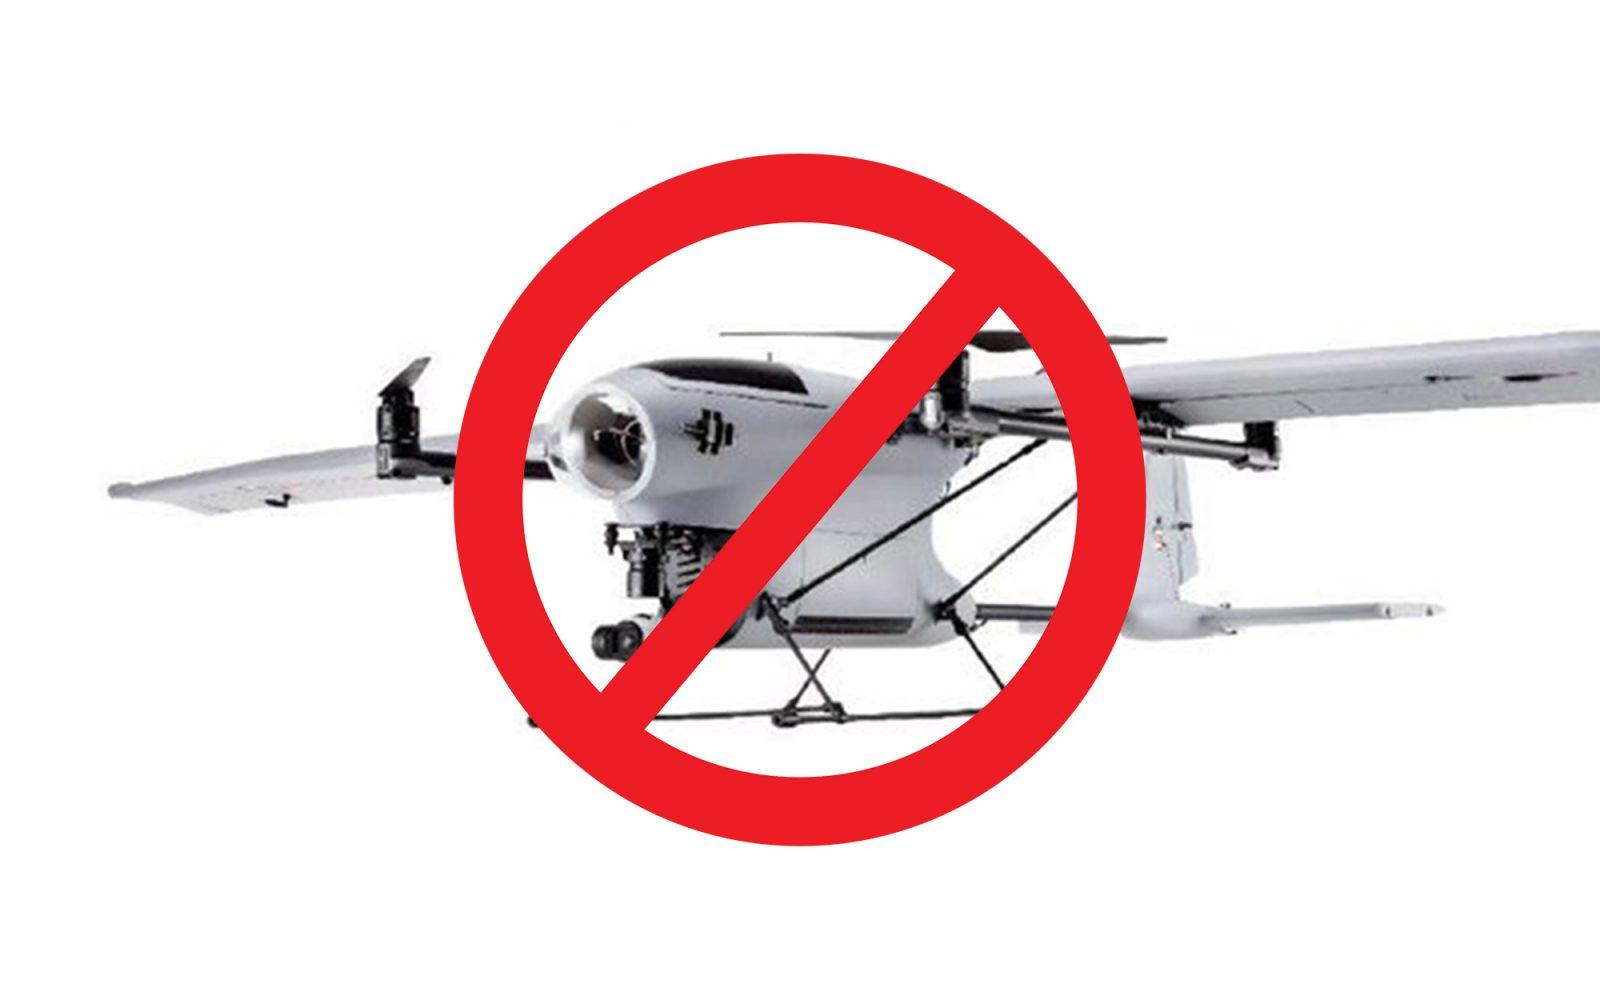 DJI dispels rumors about DJI fixed-wing VTOL drone - DroneDJ